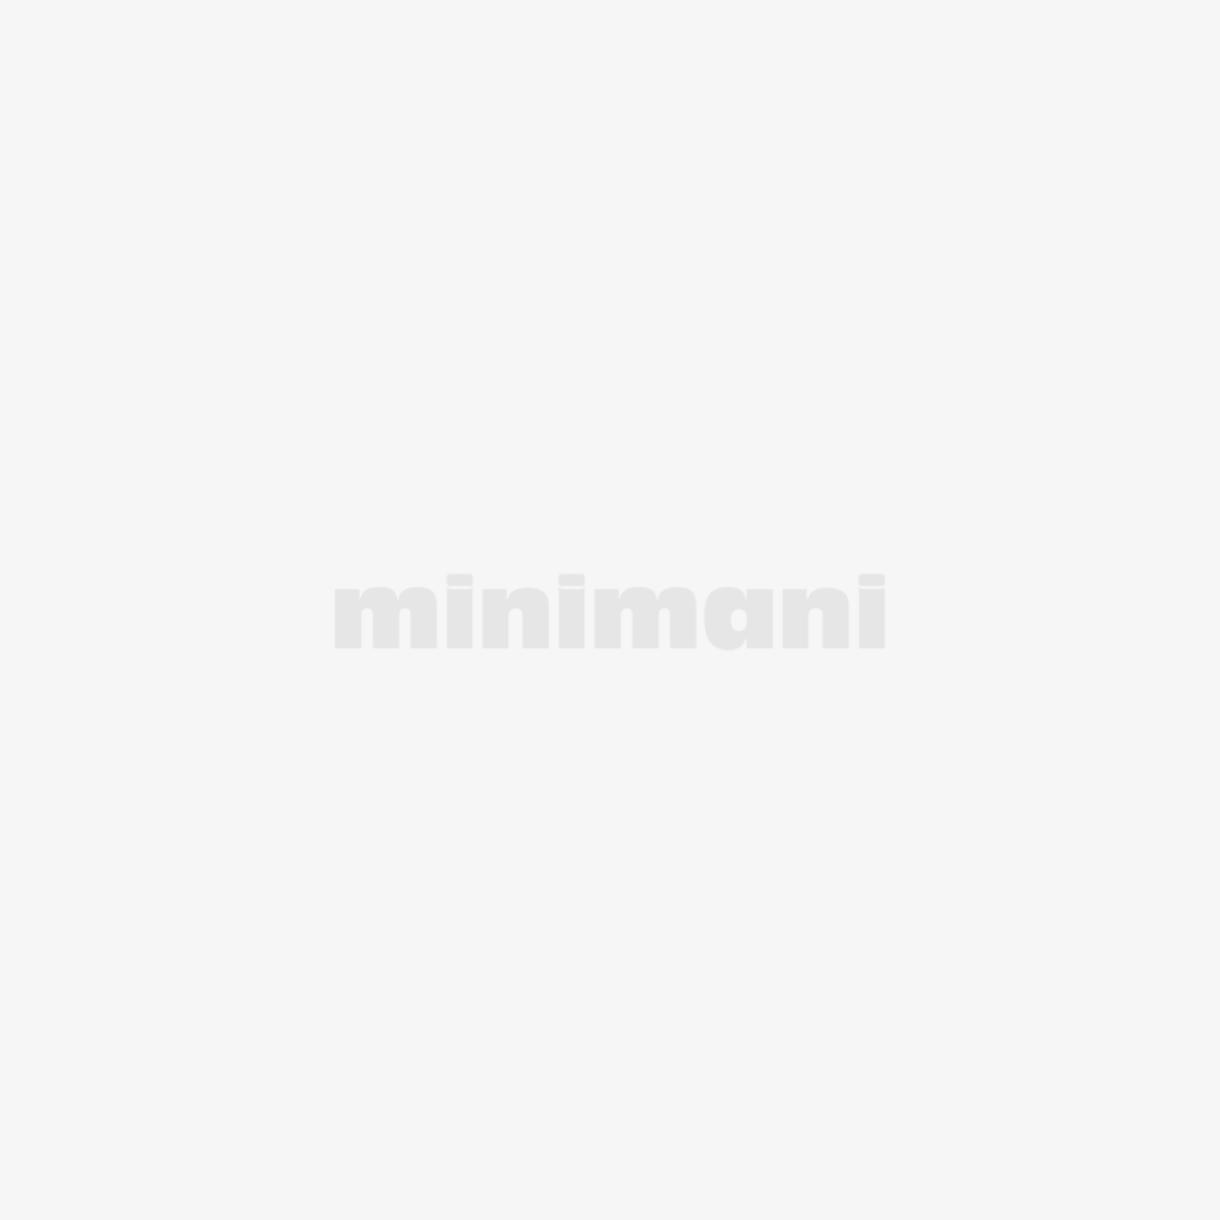 PISLA PAOLATANKO 16/19 MM 165-300 MATTA/KROM